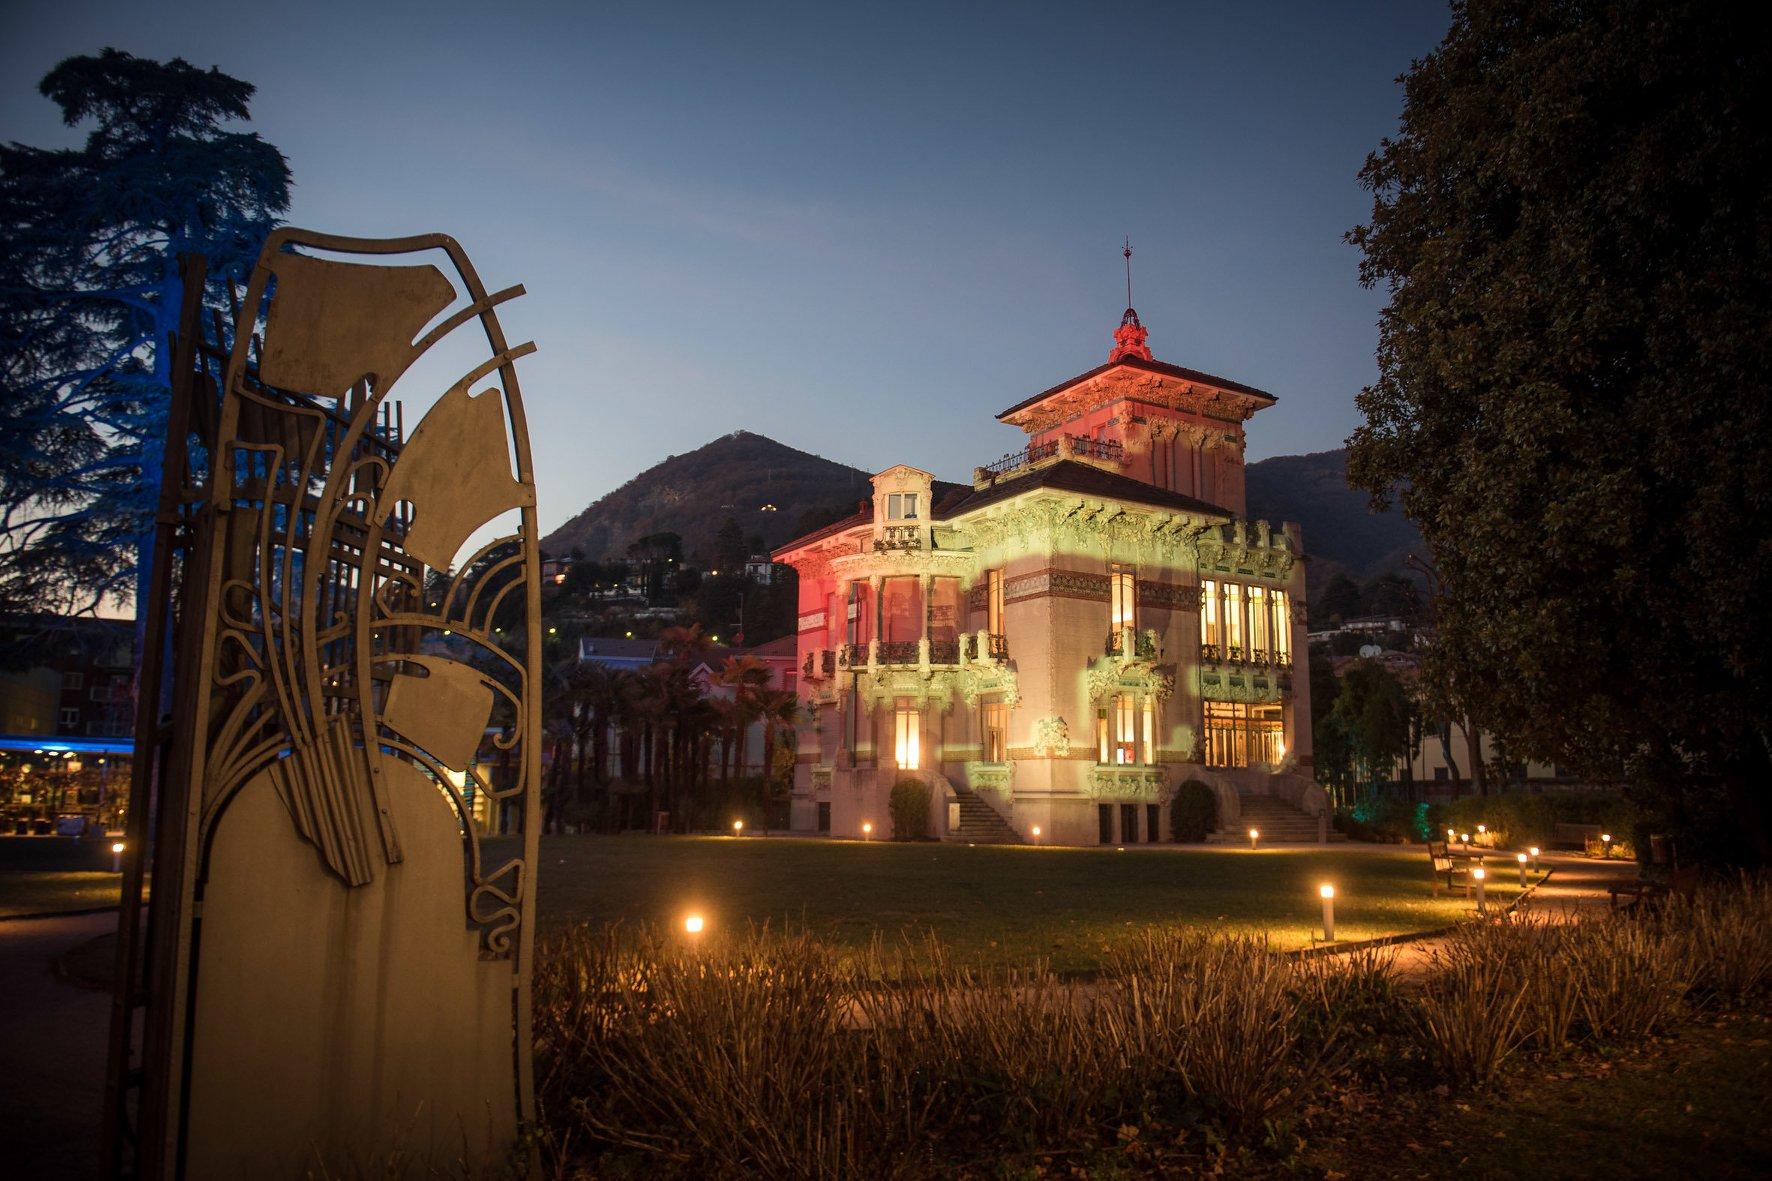 villa bernasconi cernobbio storia e visite